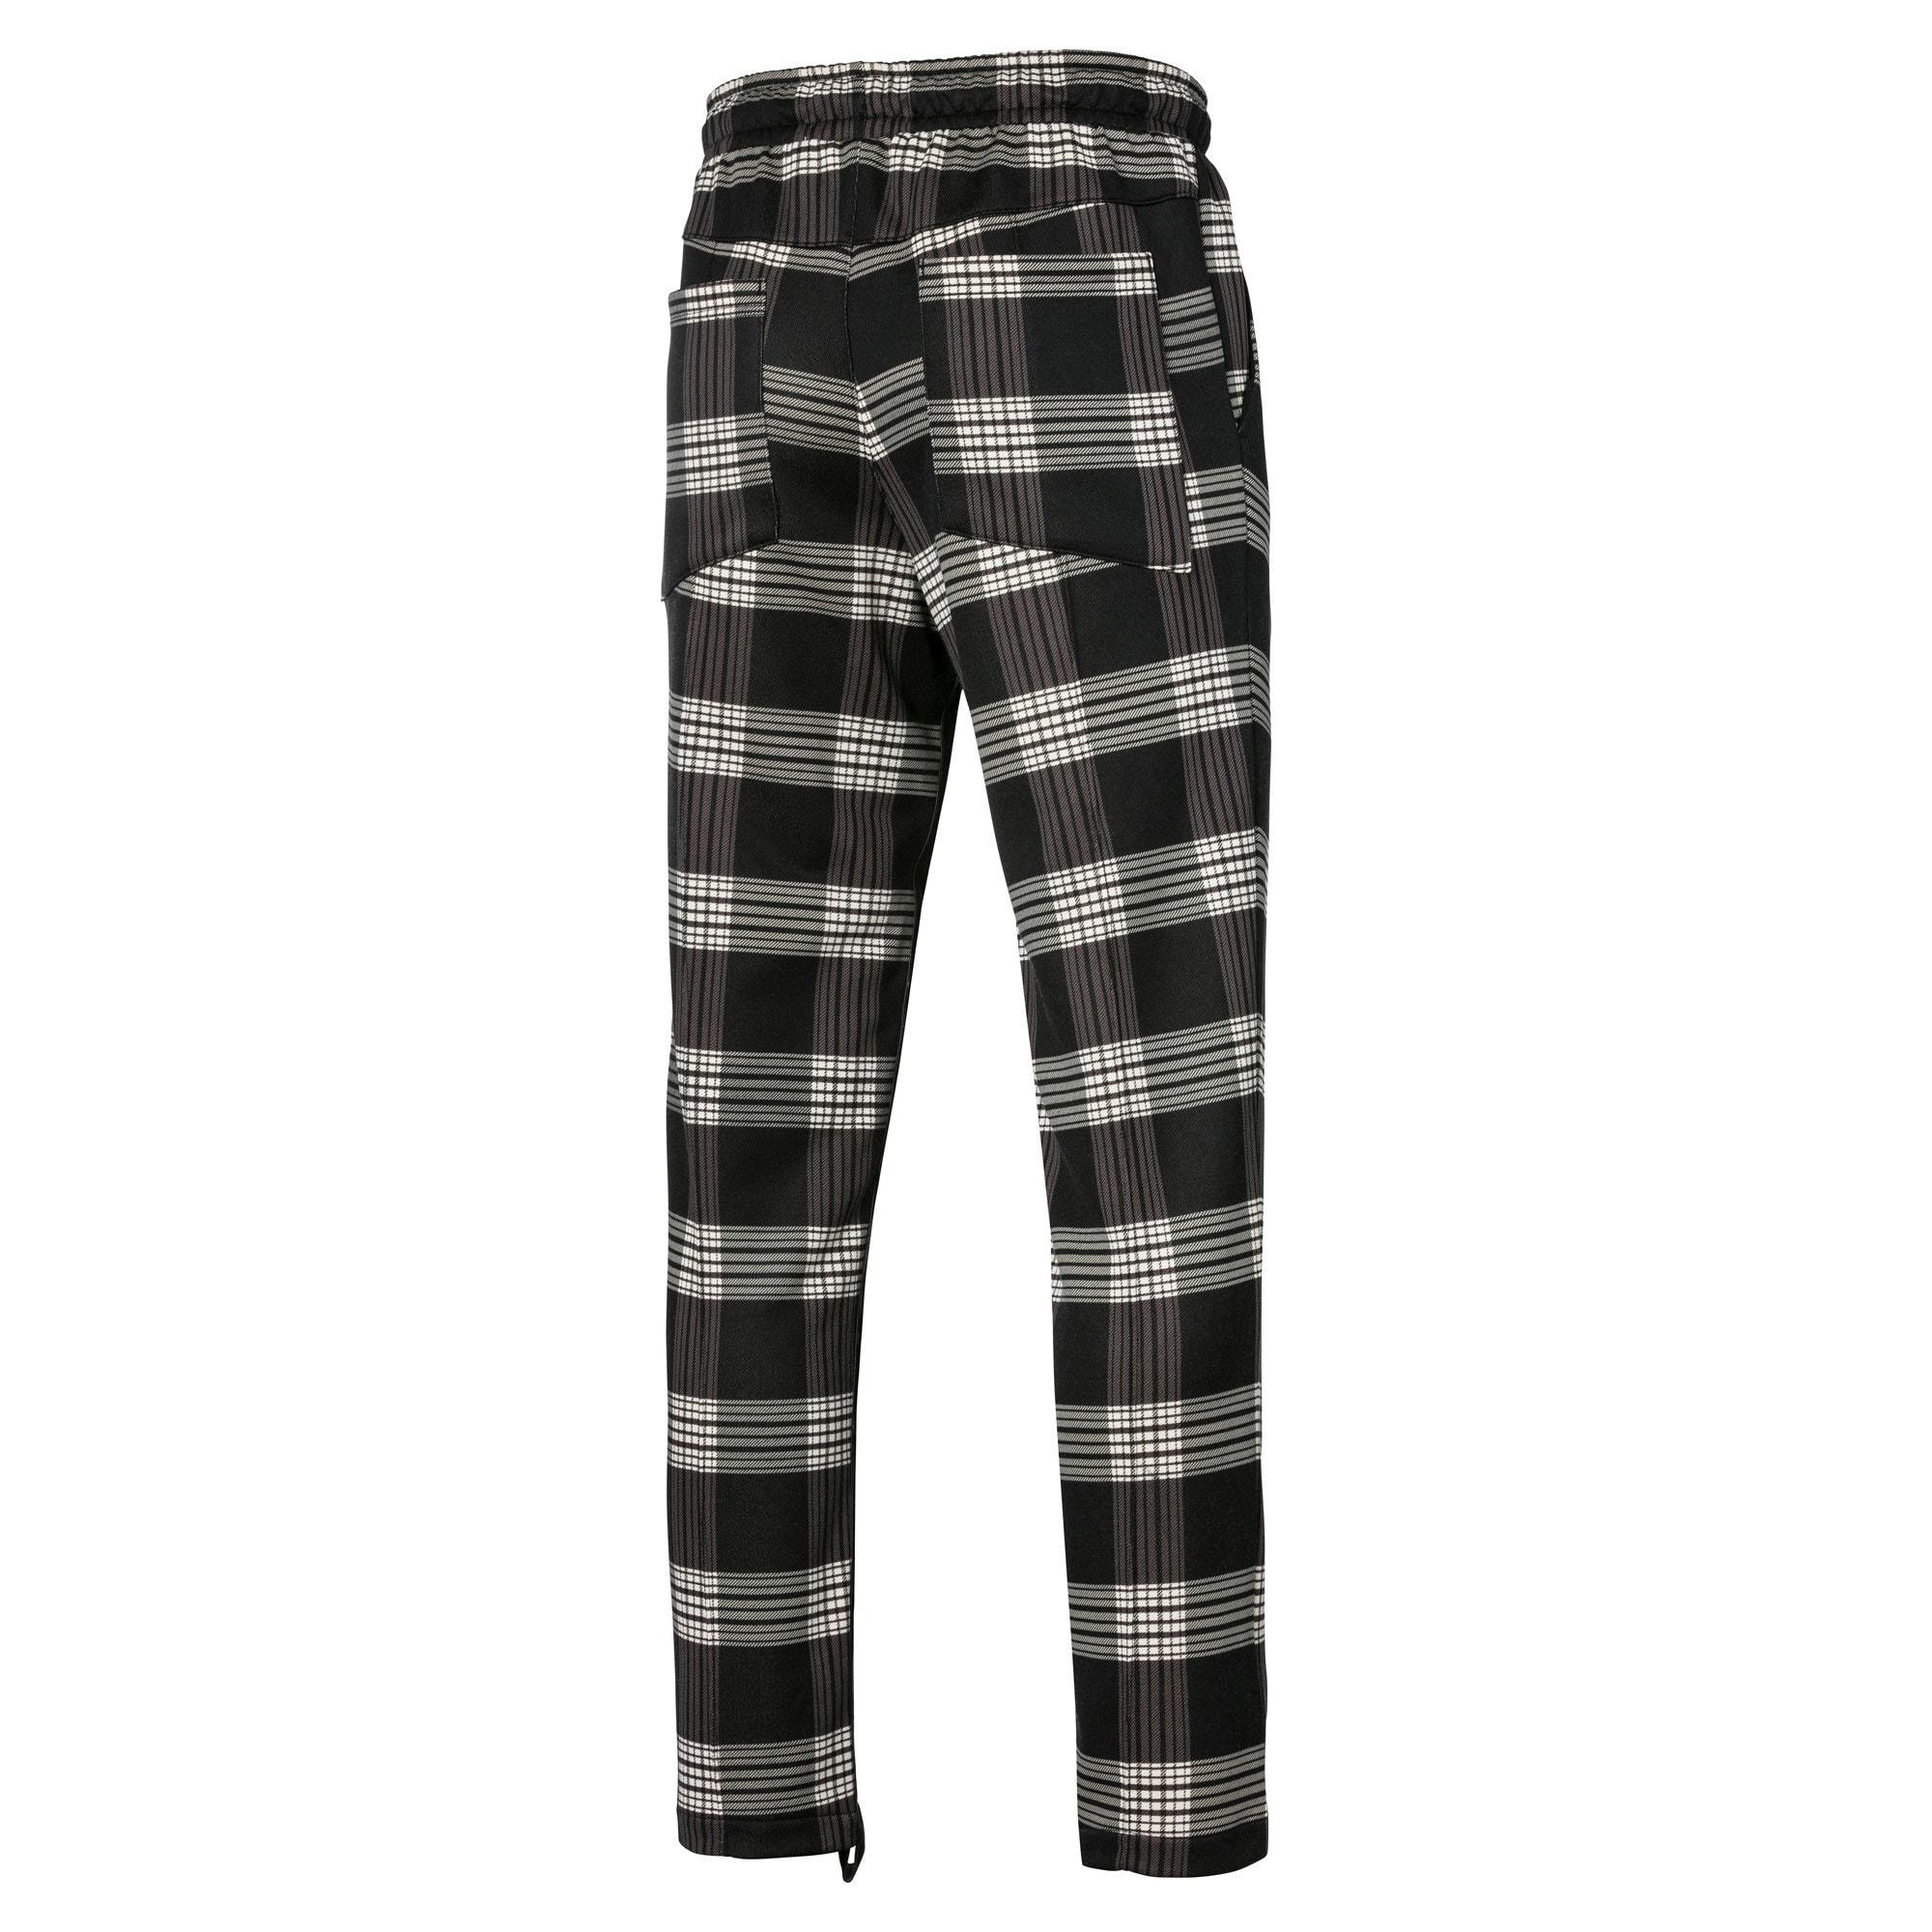 Anteprima 2 di PUMA x RHUDE All-Over Print Knitted Men's Track Pants, Puma White AOP, medio